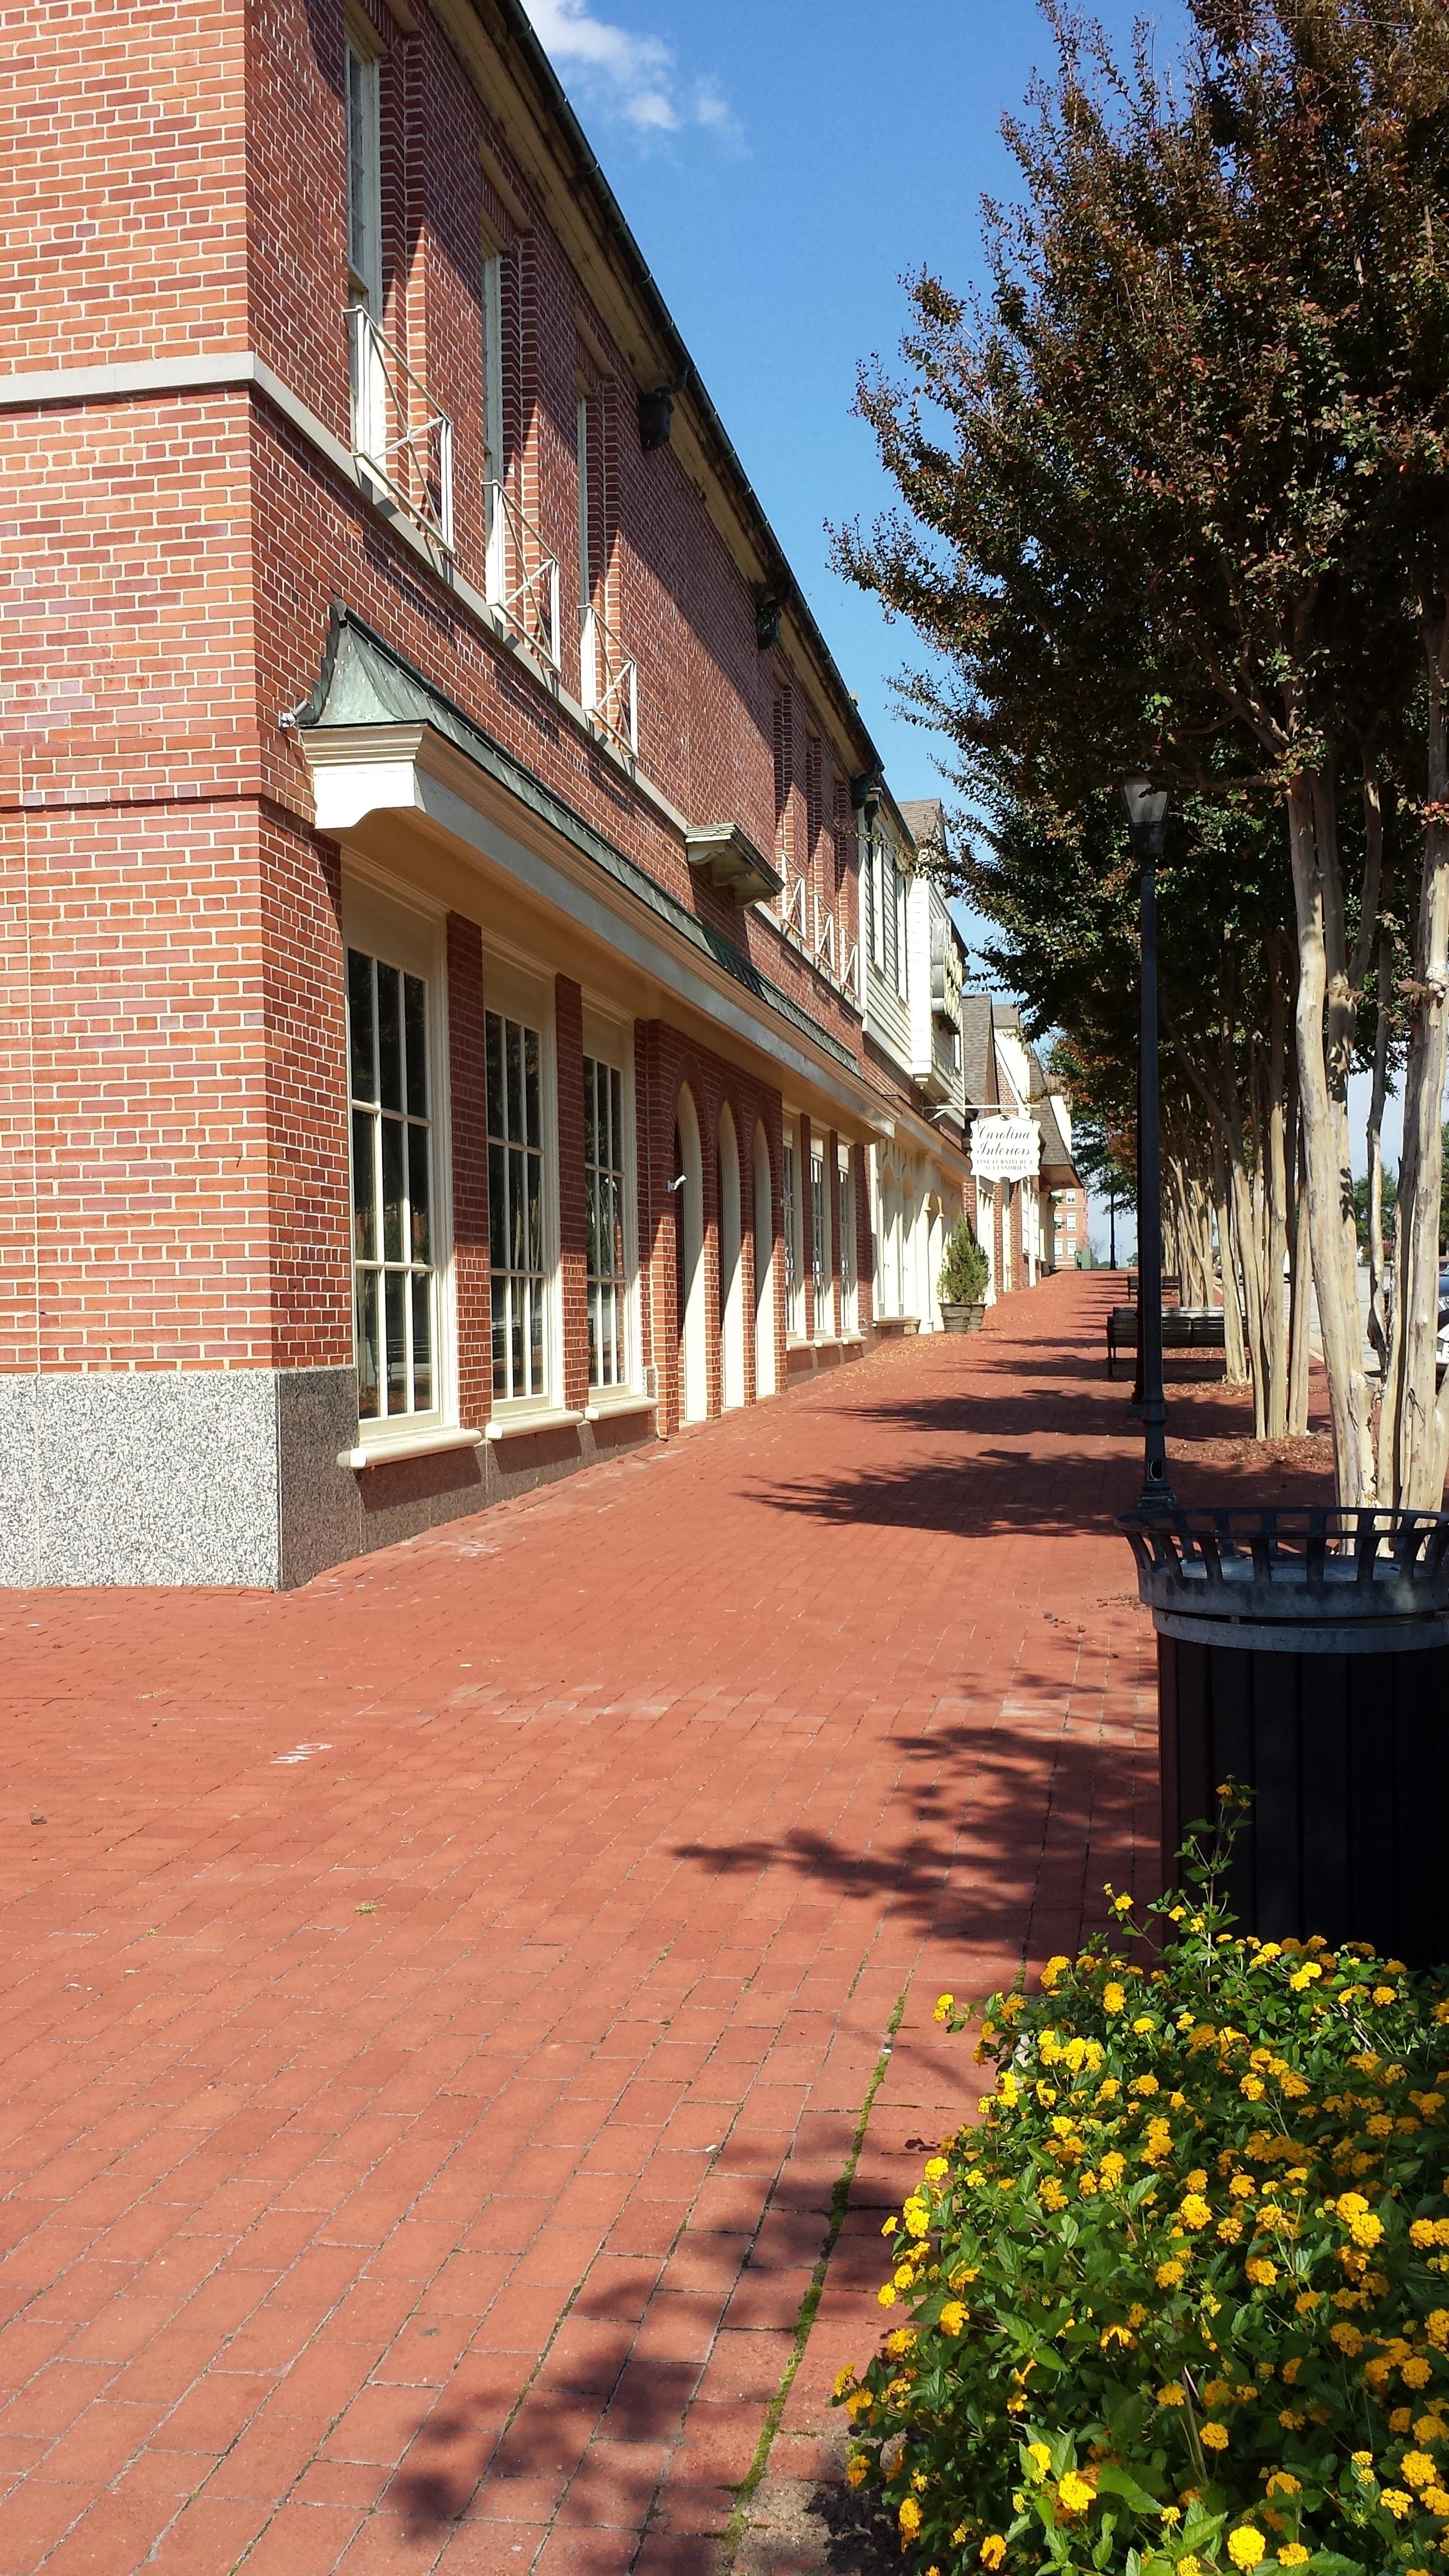 Kannapolis, North Carolina: A Long-Term, Large-Scale ...